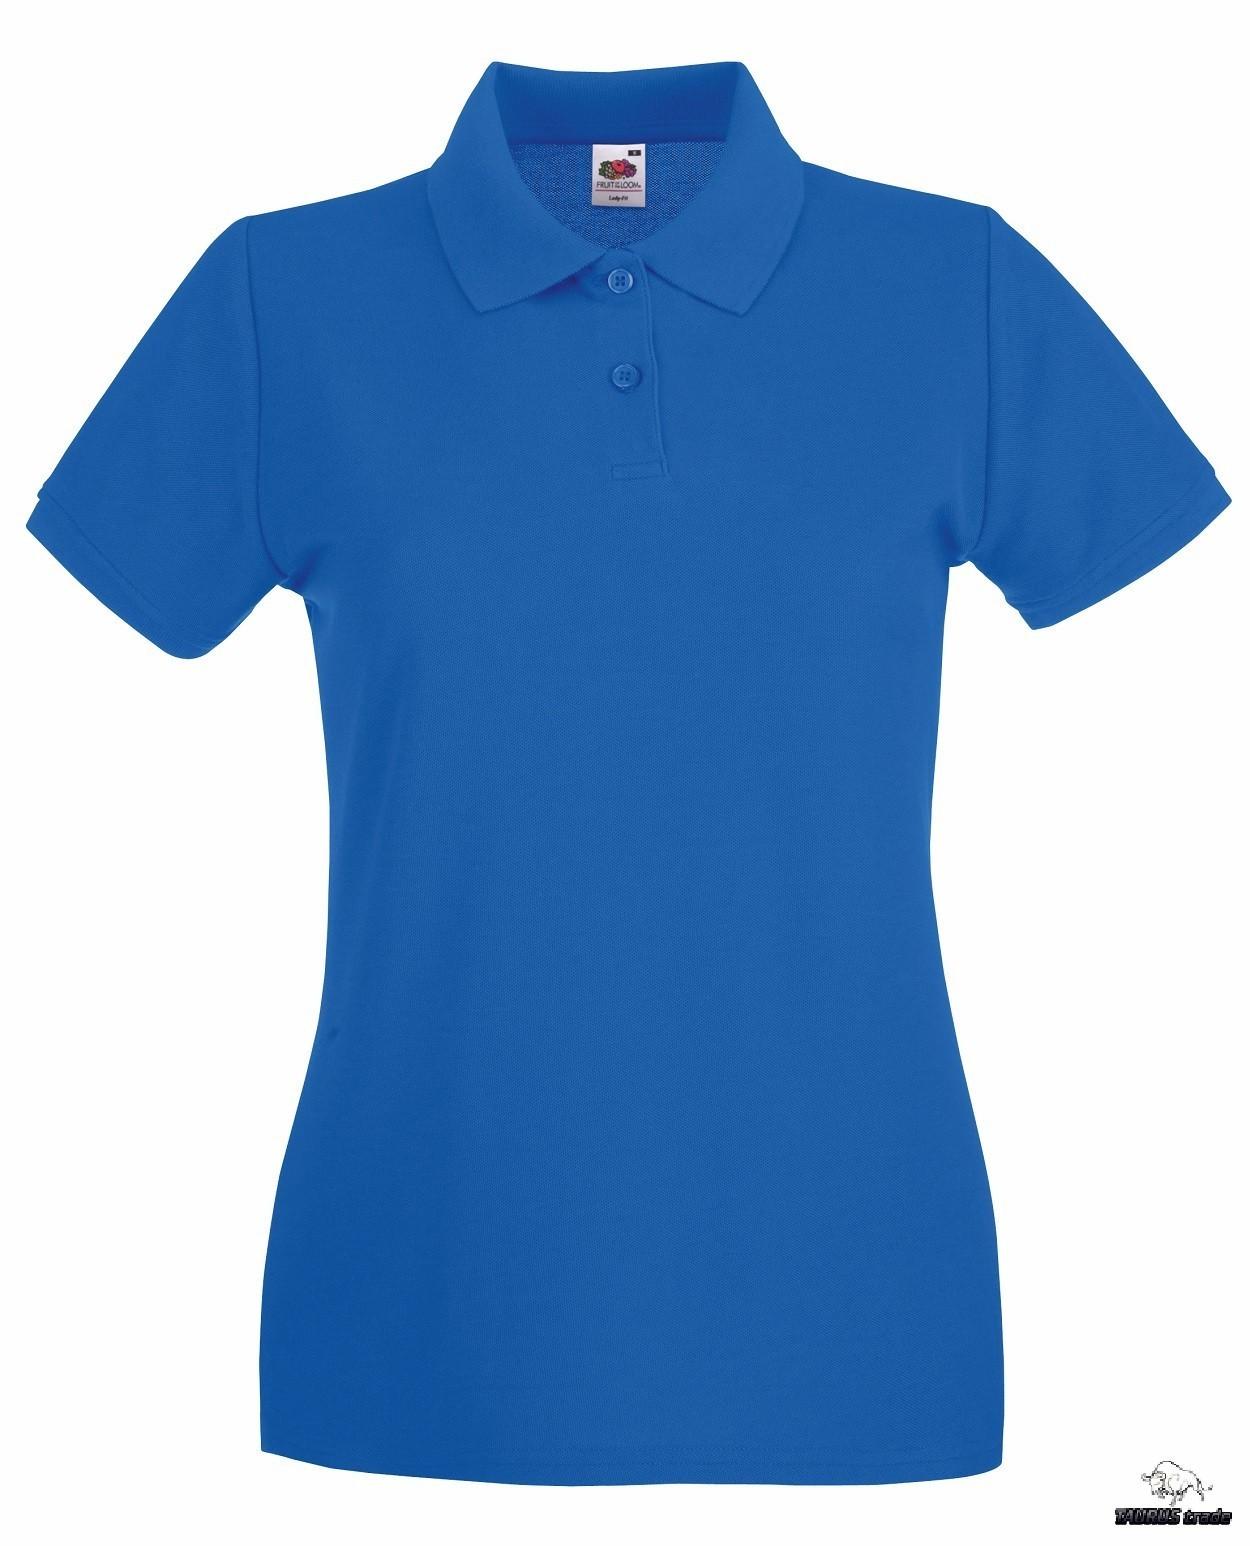 63-030-royal blue